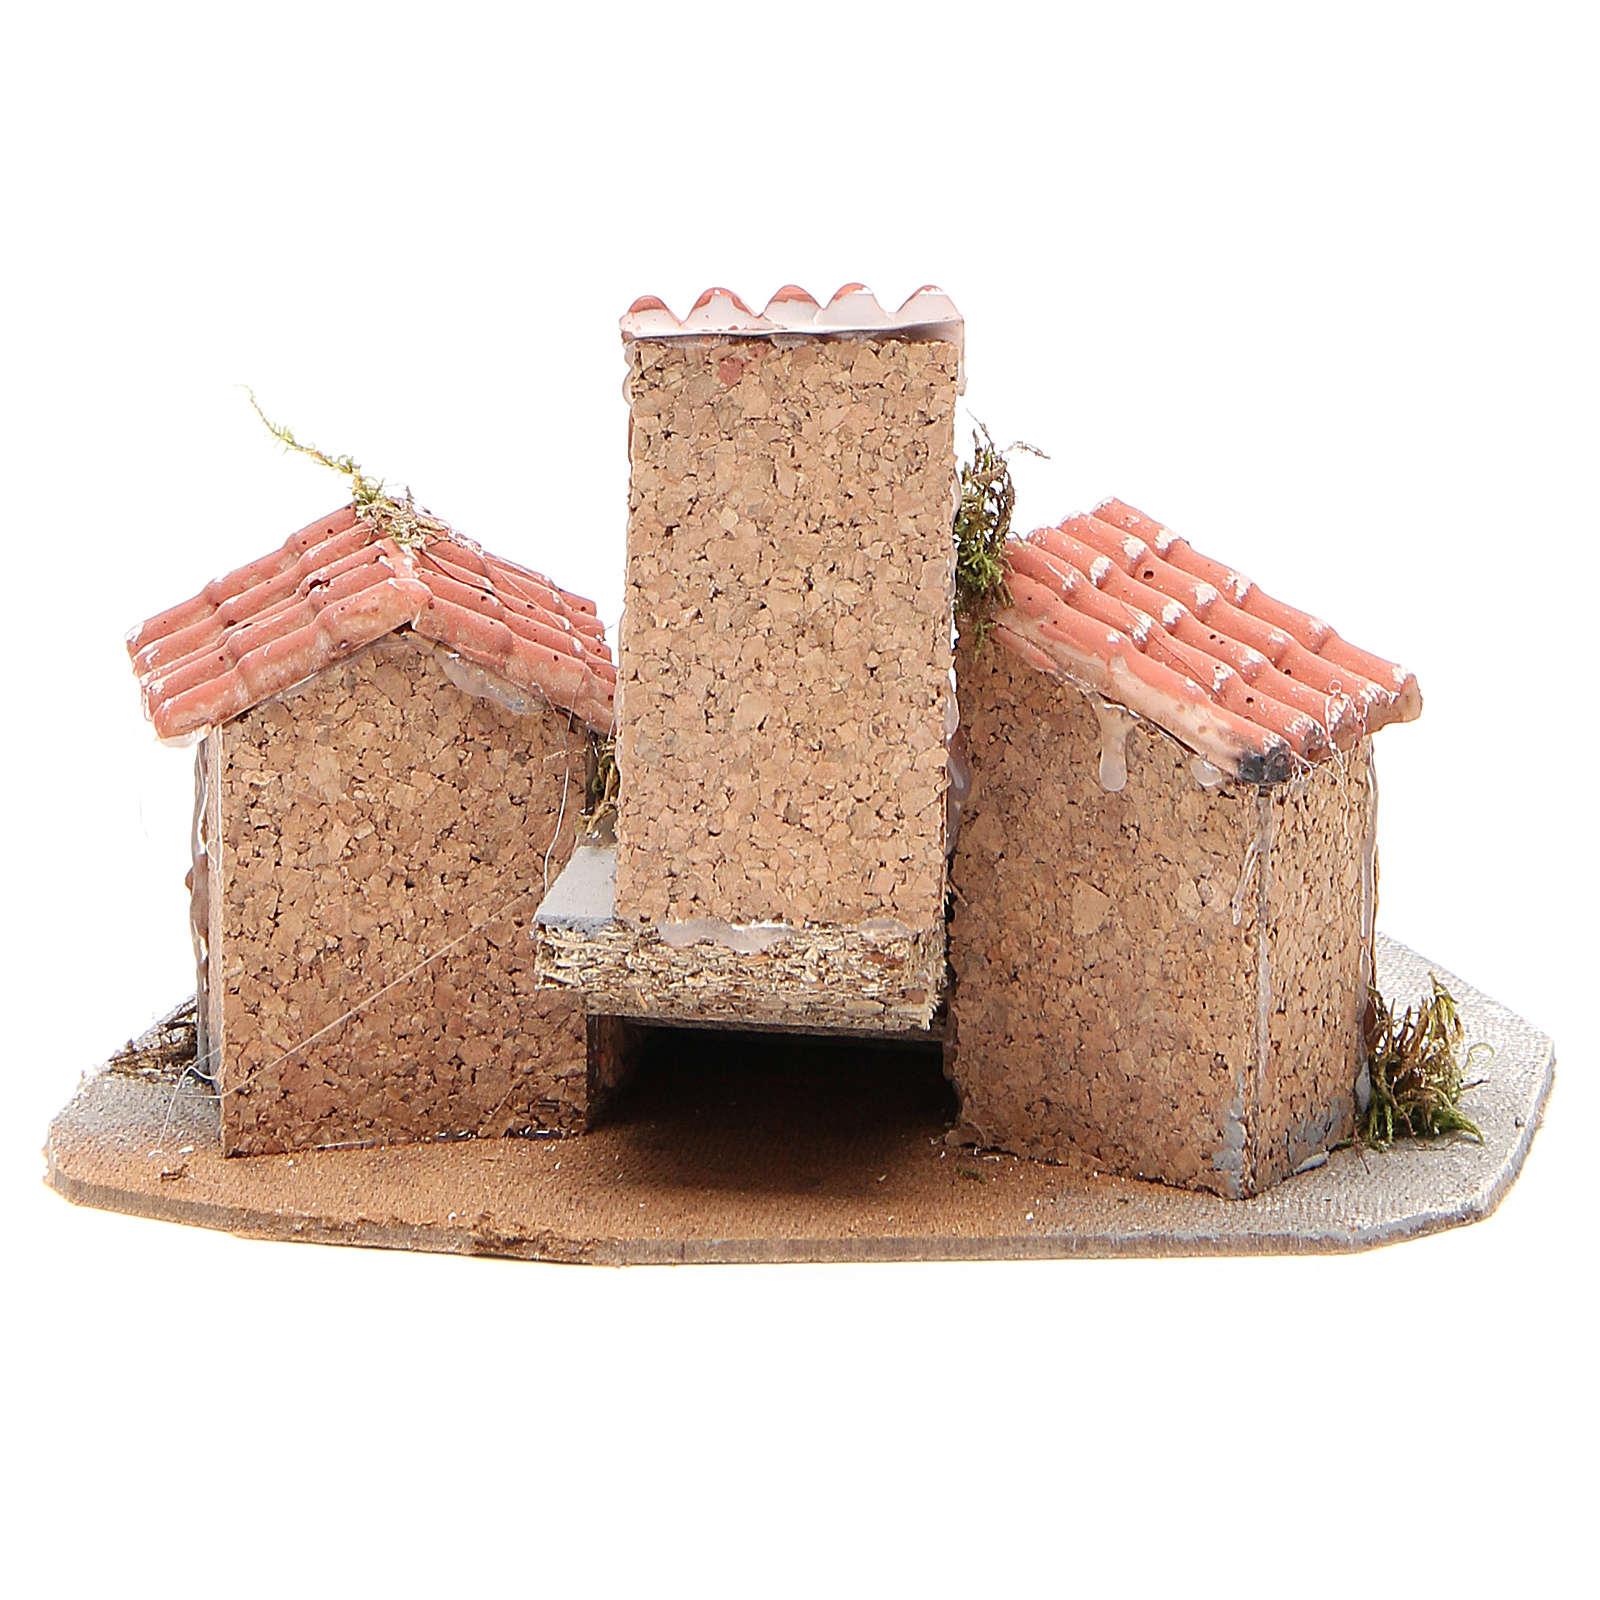 Composition of houses for Neapolitan Nativity scene, 17x24x20cm 4